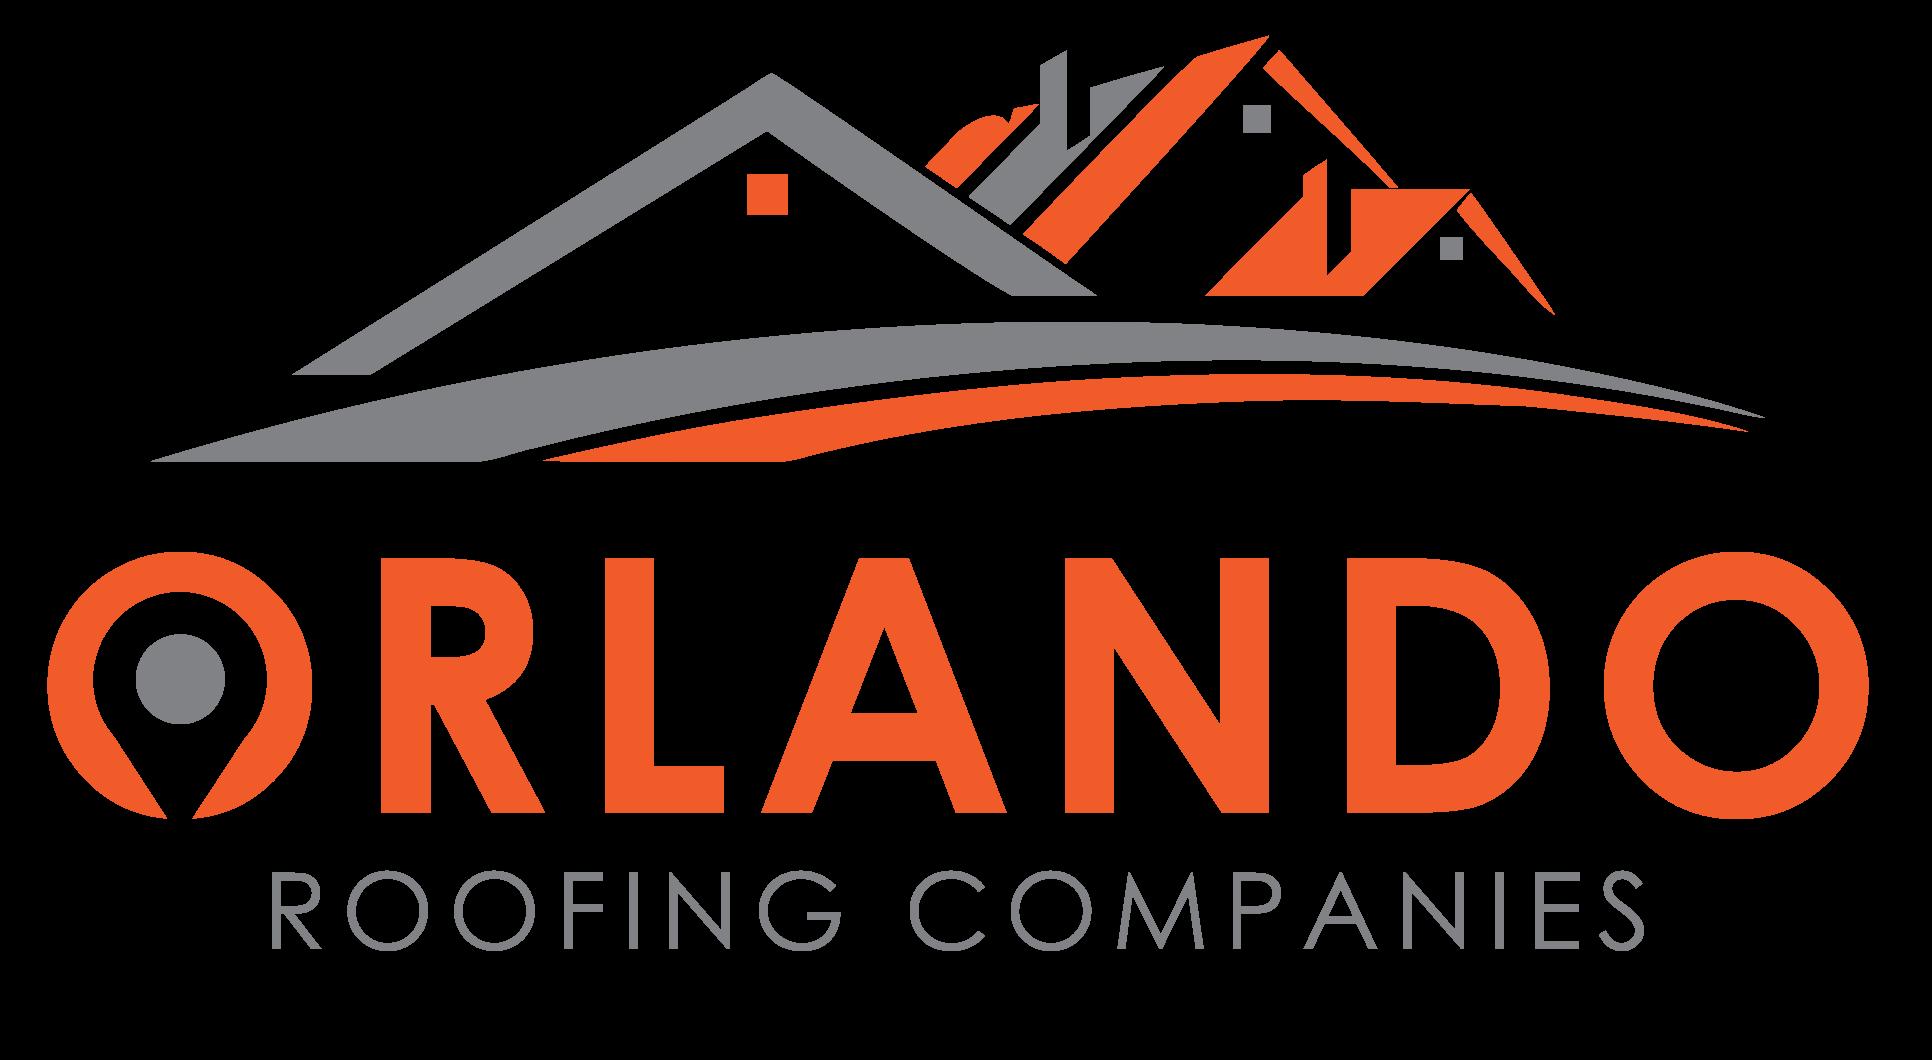 Orlando Roofing Companies